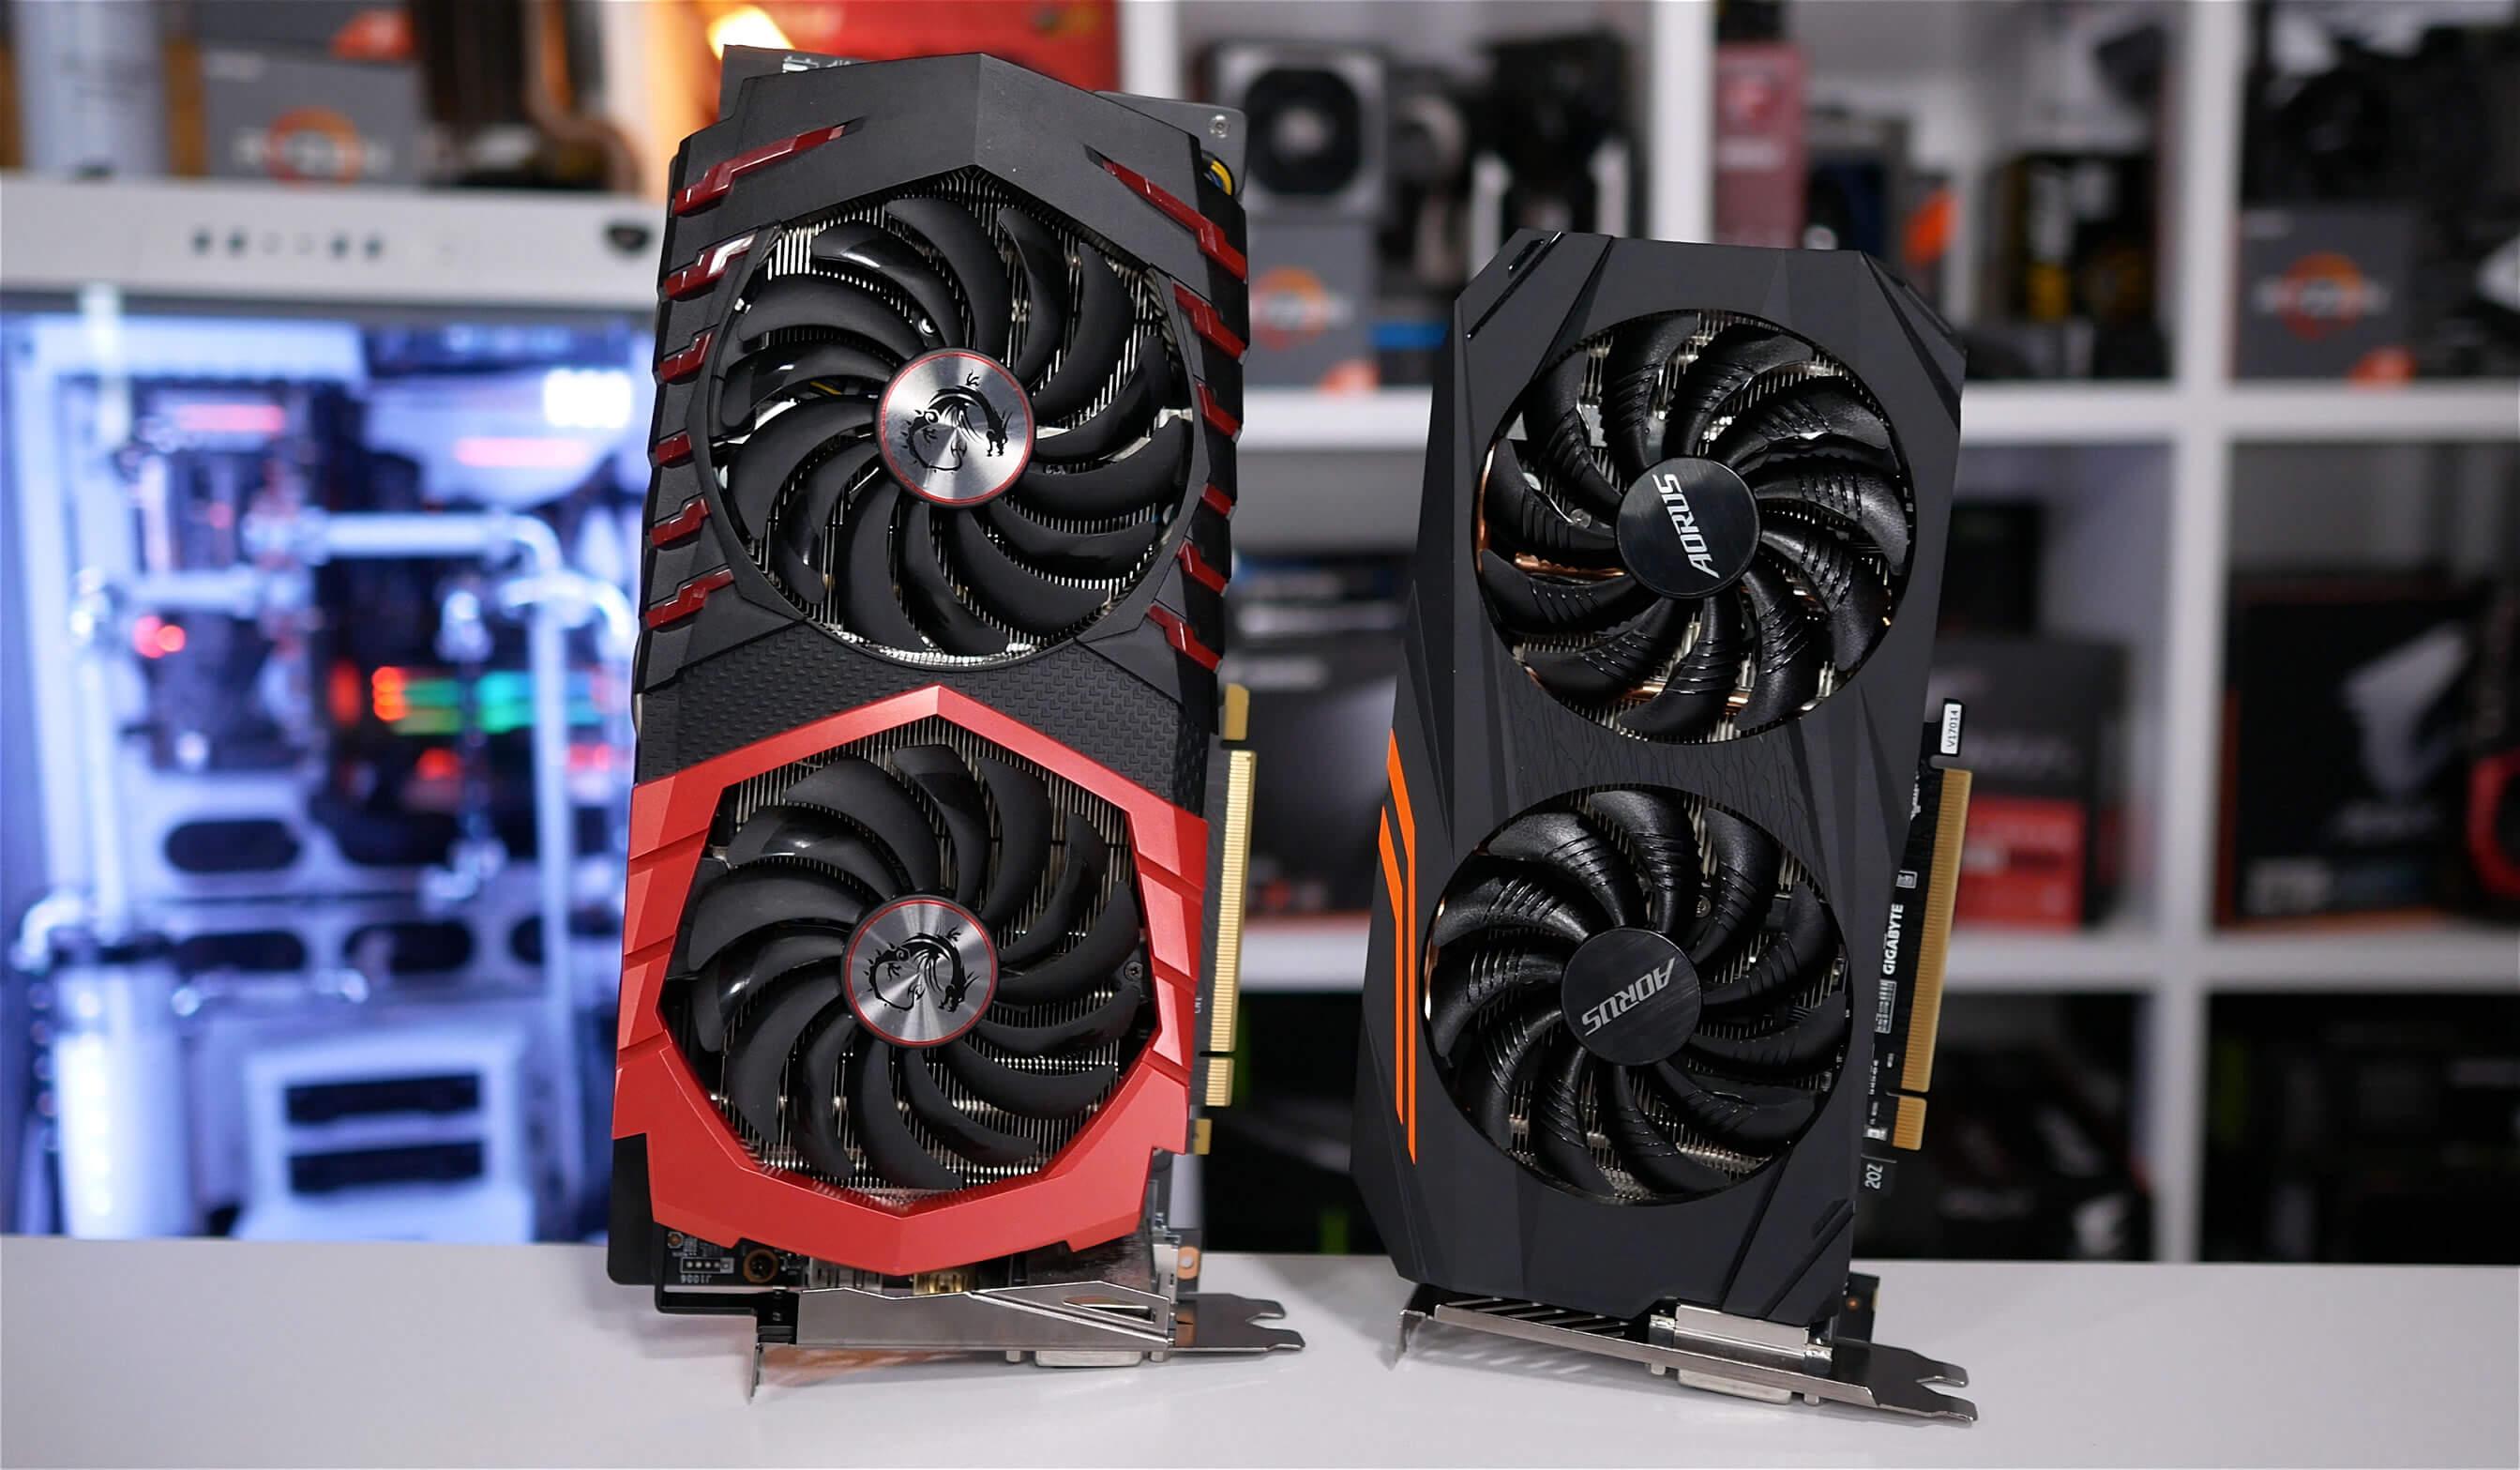 Radeon Rx 570 Vs Rx 580 Vs Geforce Gtx 1060 3gb Vs Gtx 1060 6gb